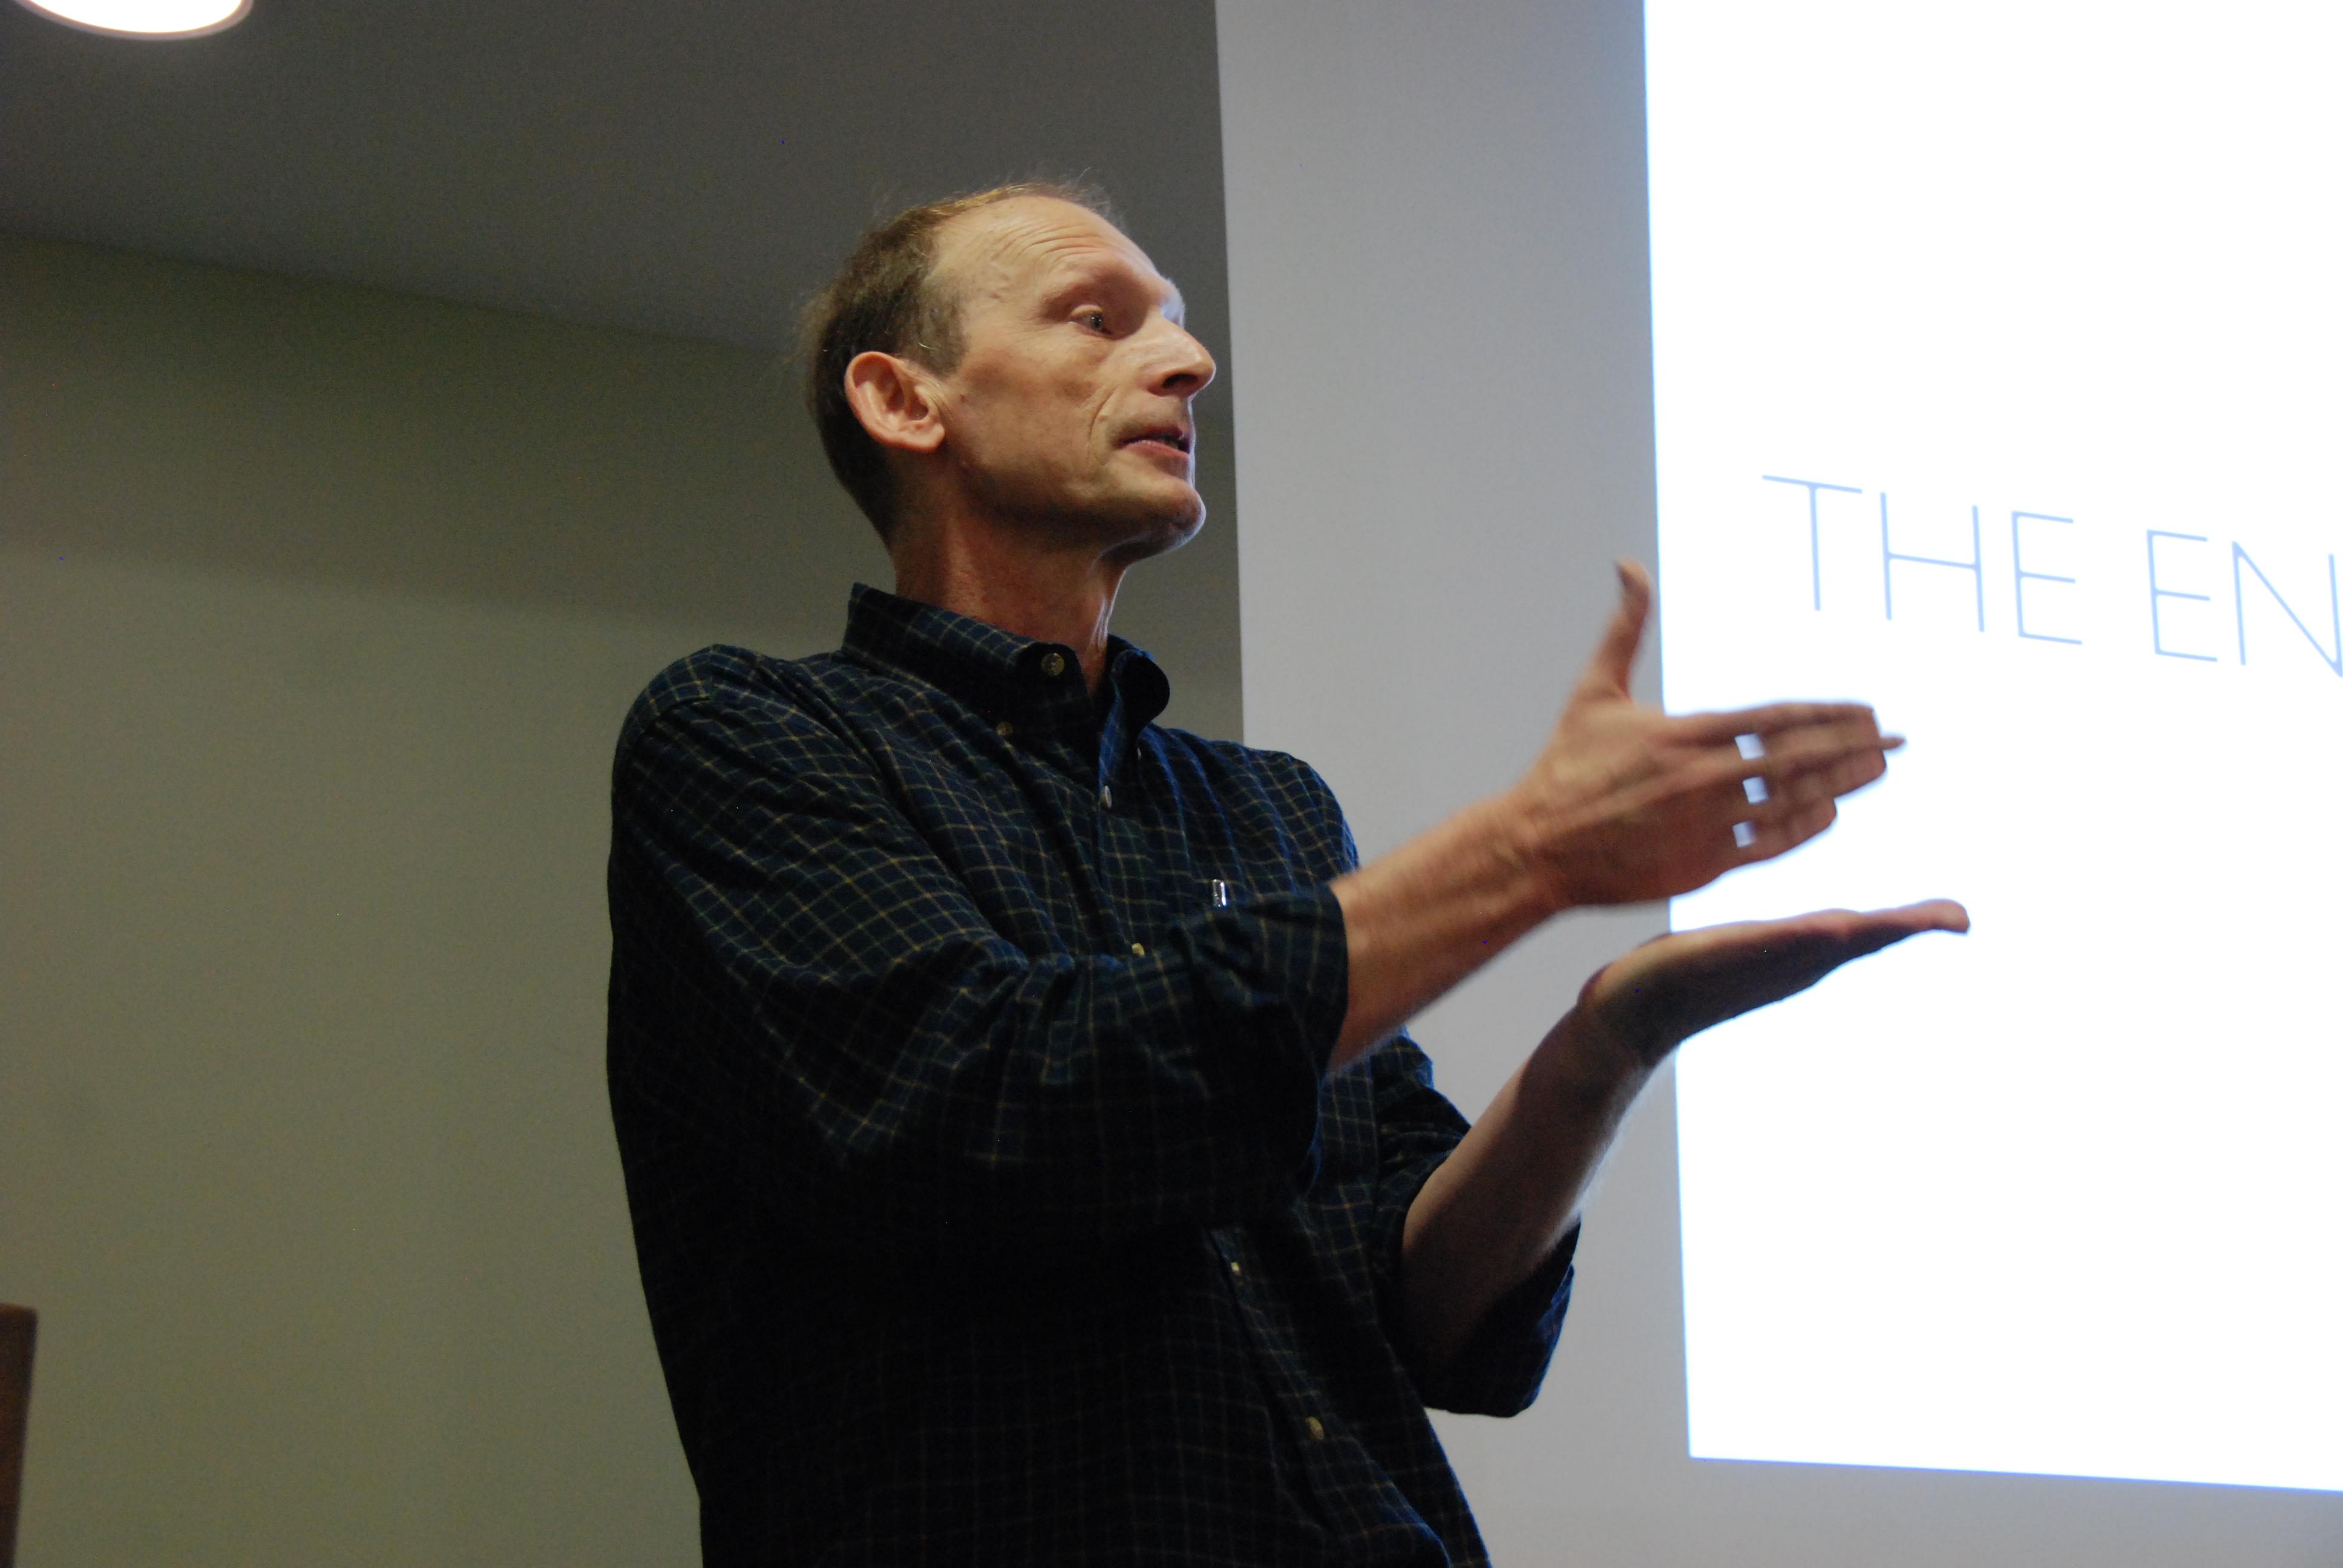 Felleisen speaking at the [[Symposium on Principles of Programming Languages]] in [[Madrid, Spain]] in 2010